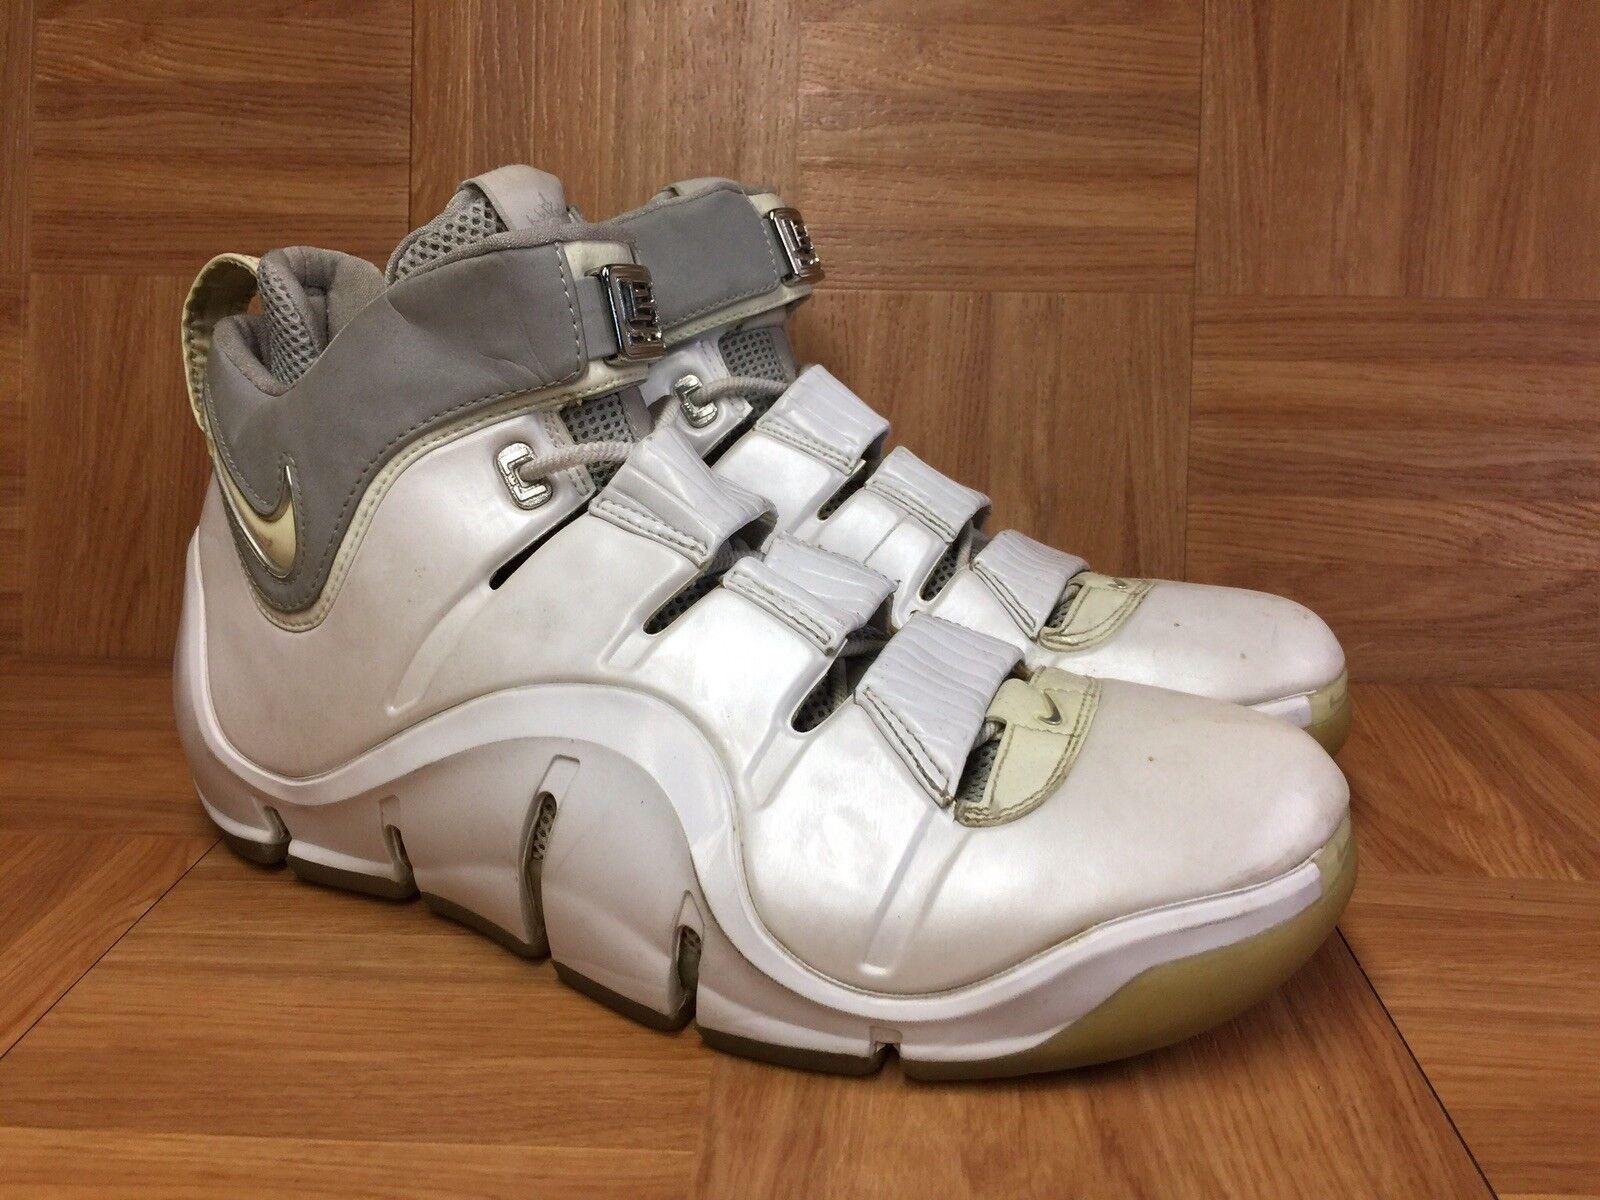 VNTG Nike Zoom LeBron 4 IV White Reflective Silver Chrome Sz 11.5 314647-112